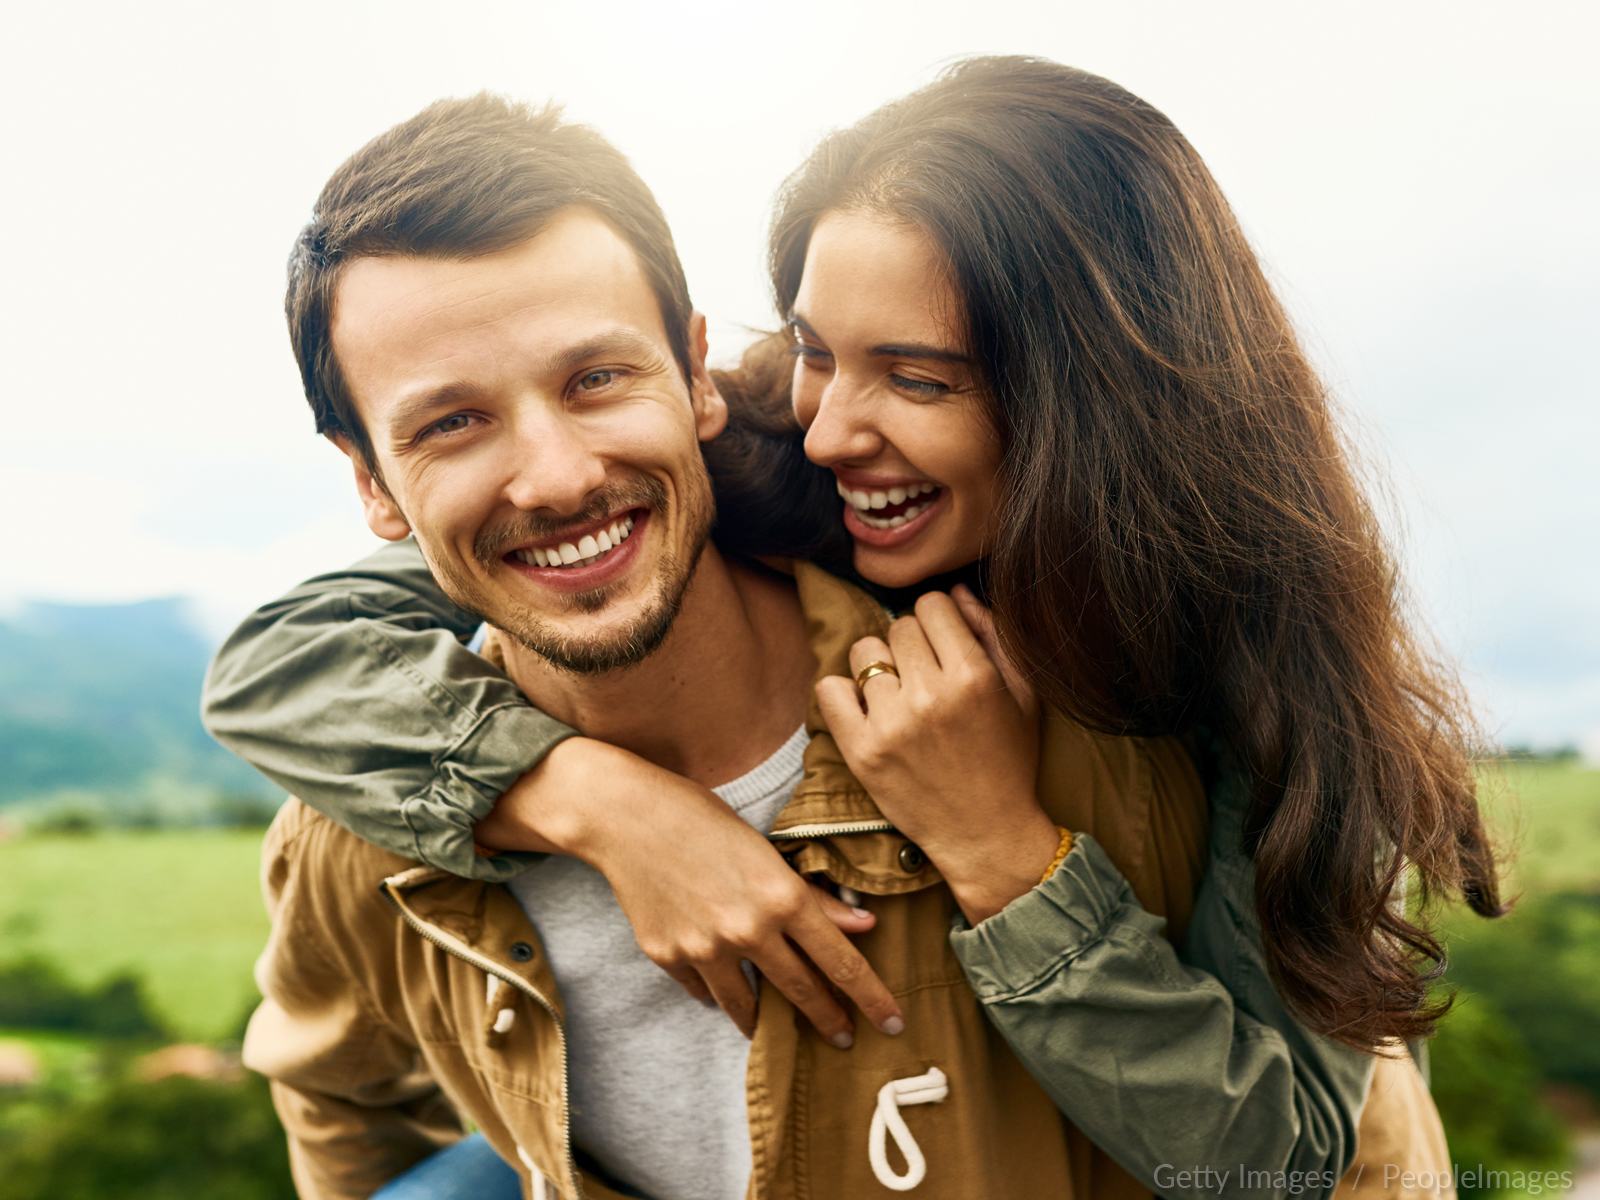 Namoro santo: pureza ao escolher o verdadeiro amor